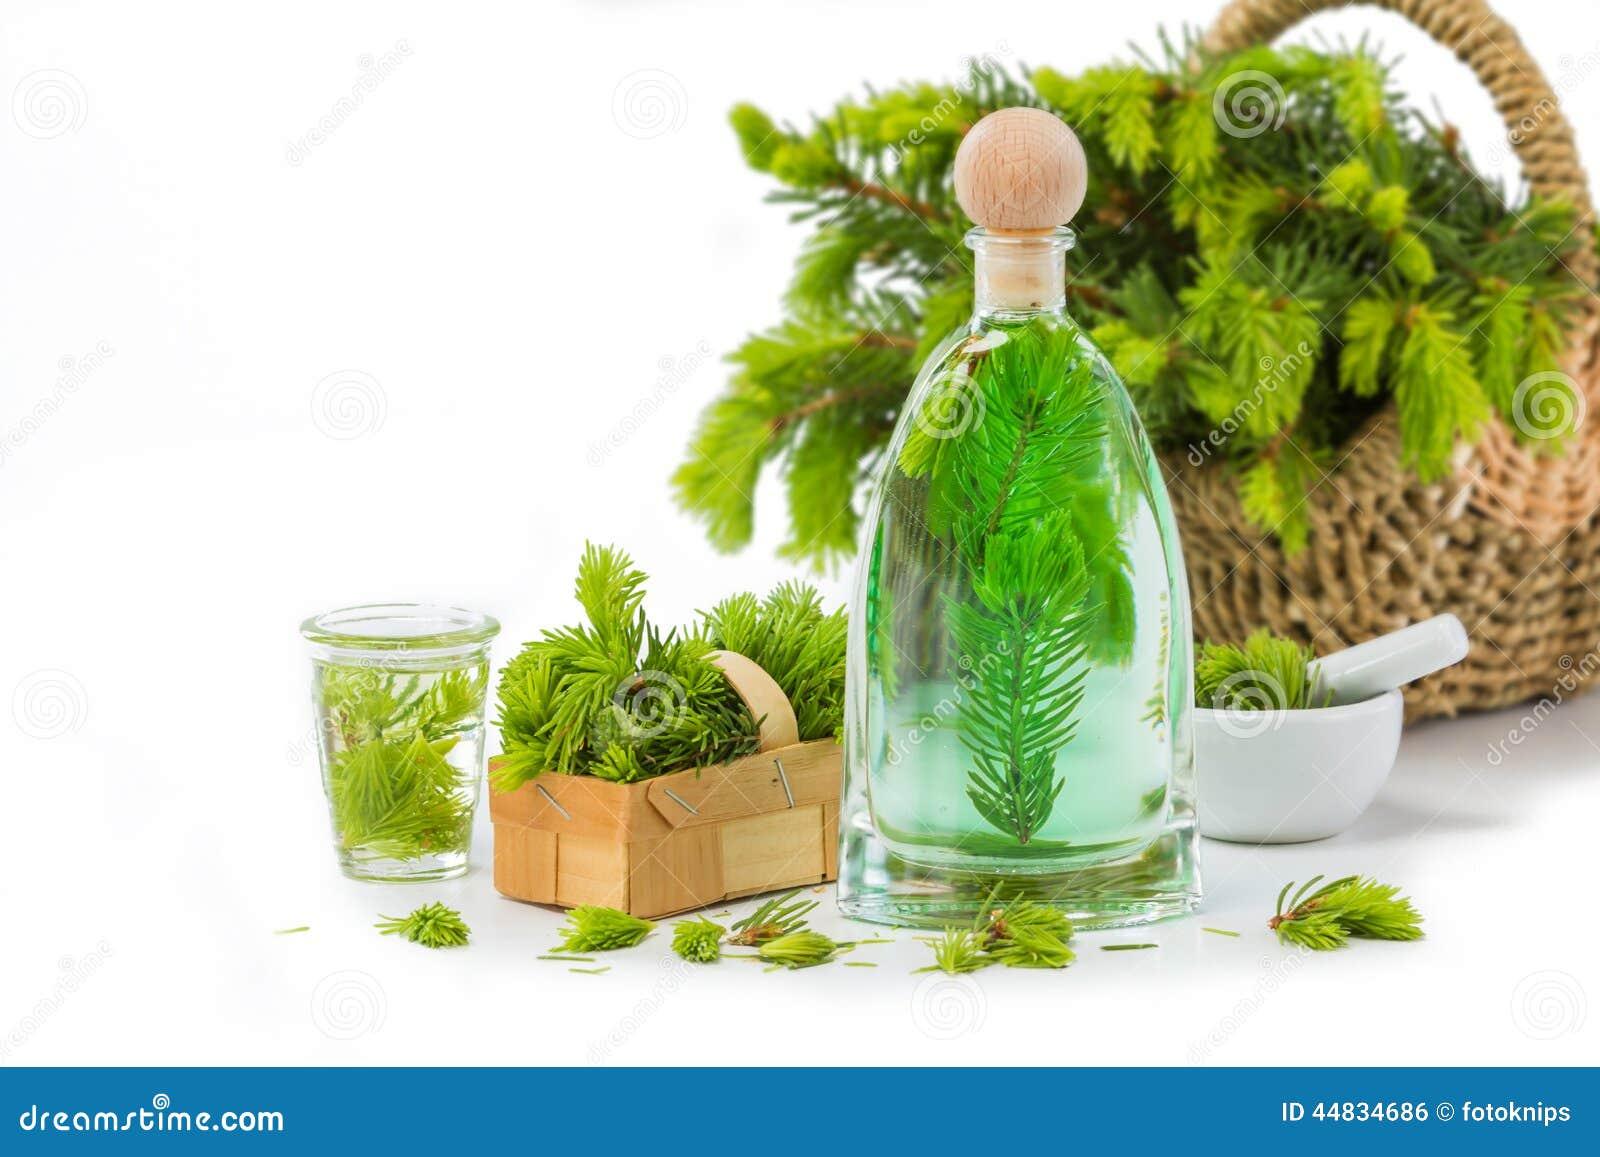 Spruce needle bad, Medicinal plants